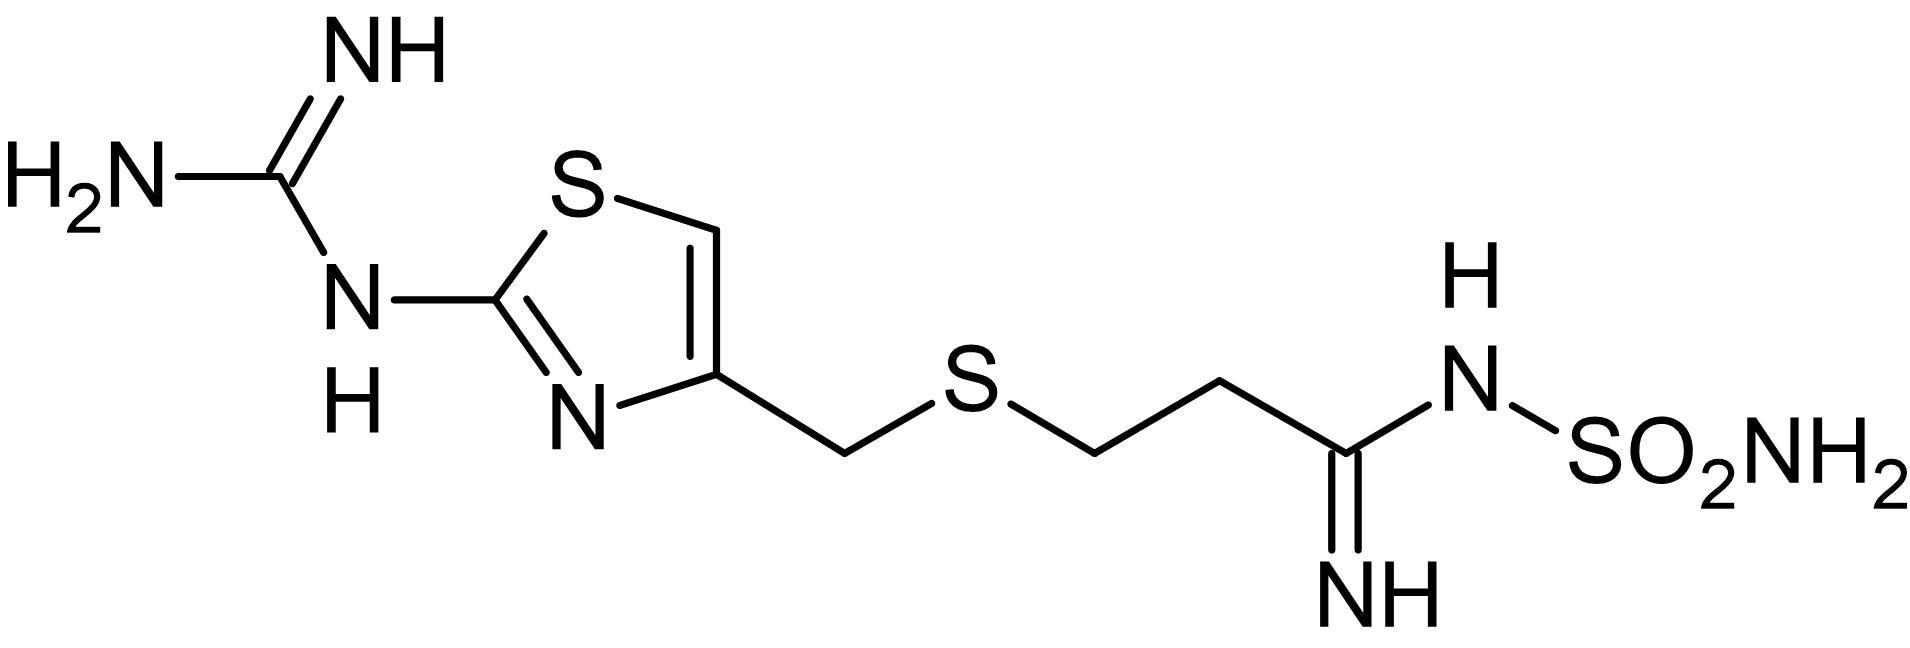 Chemical Structure - Famotidine, H<sub>2</sub> antagonist (ab120760)